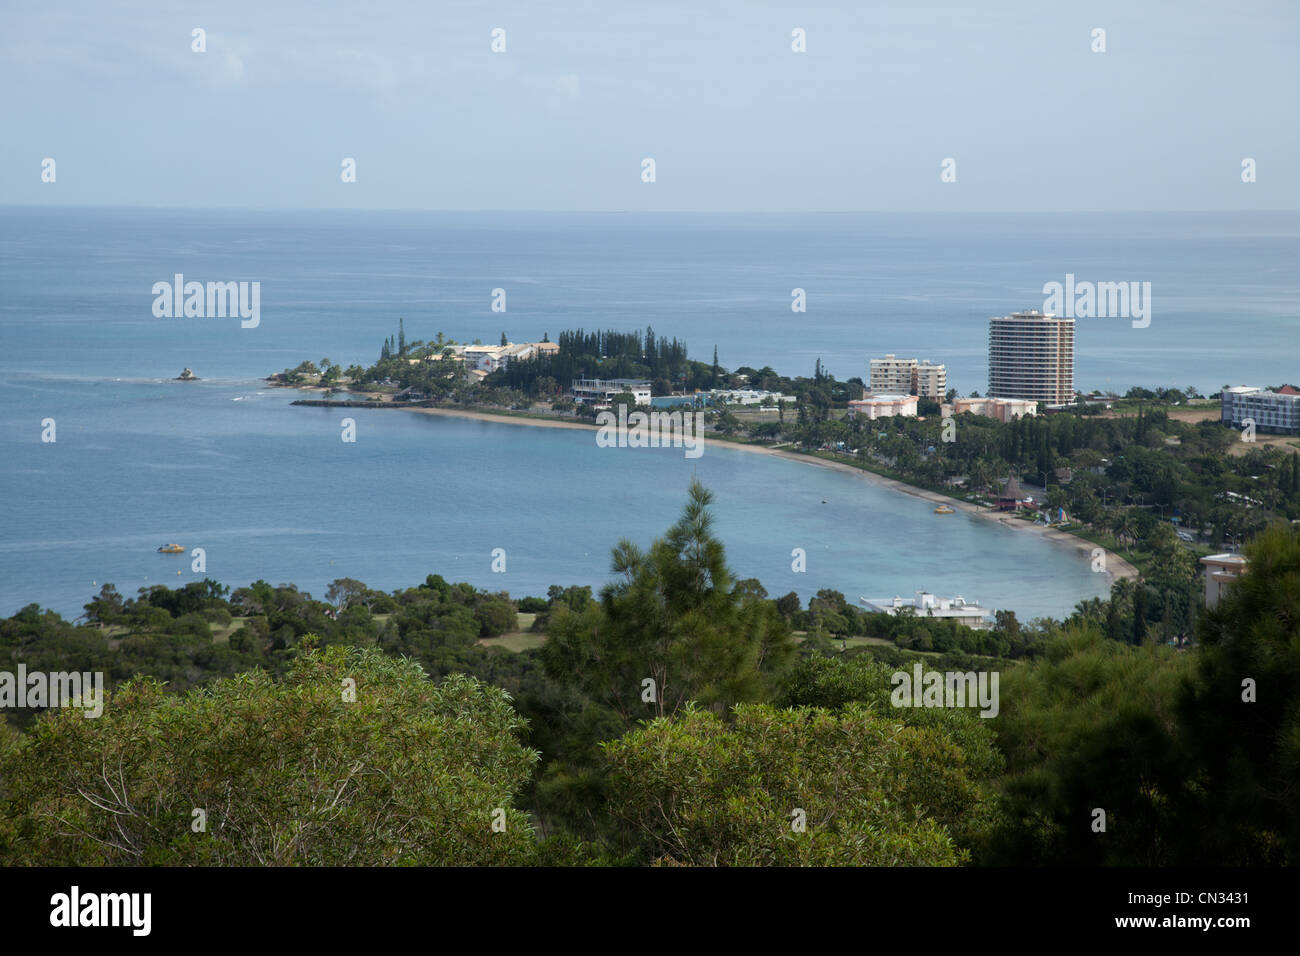 Noumea New Caledonia - Stock Image